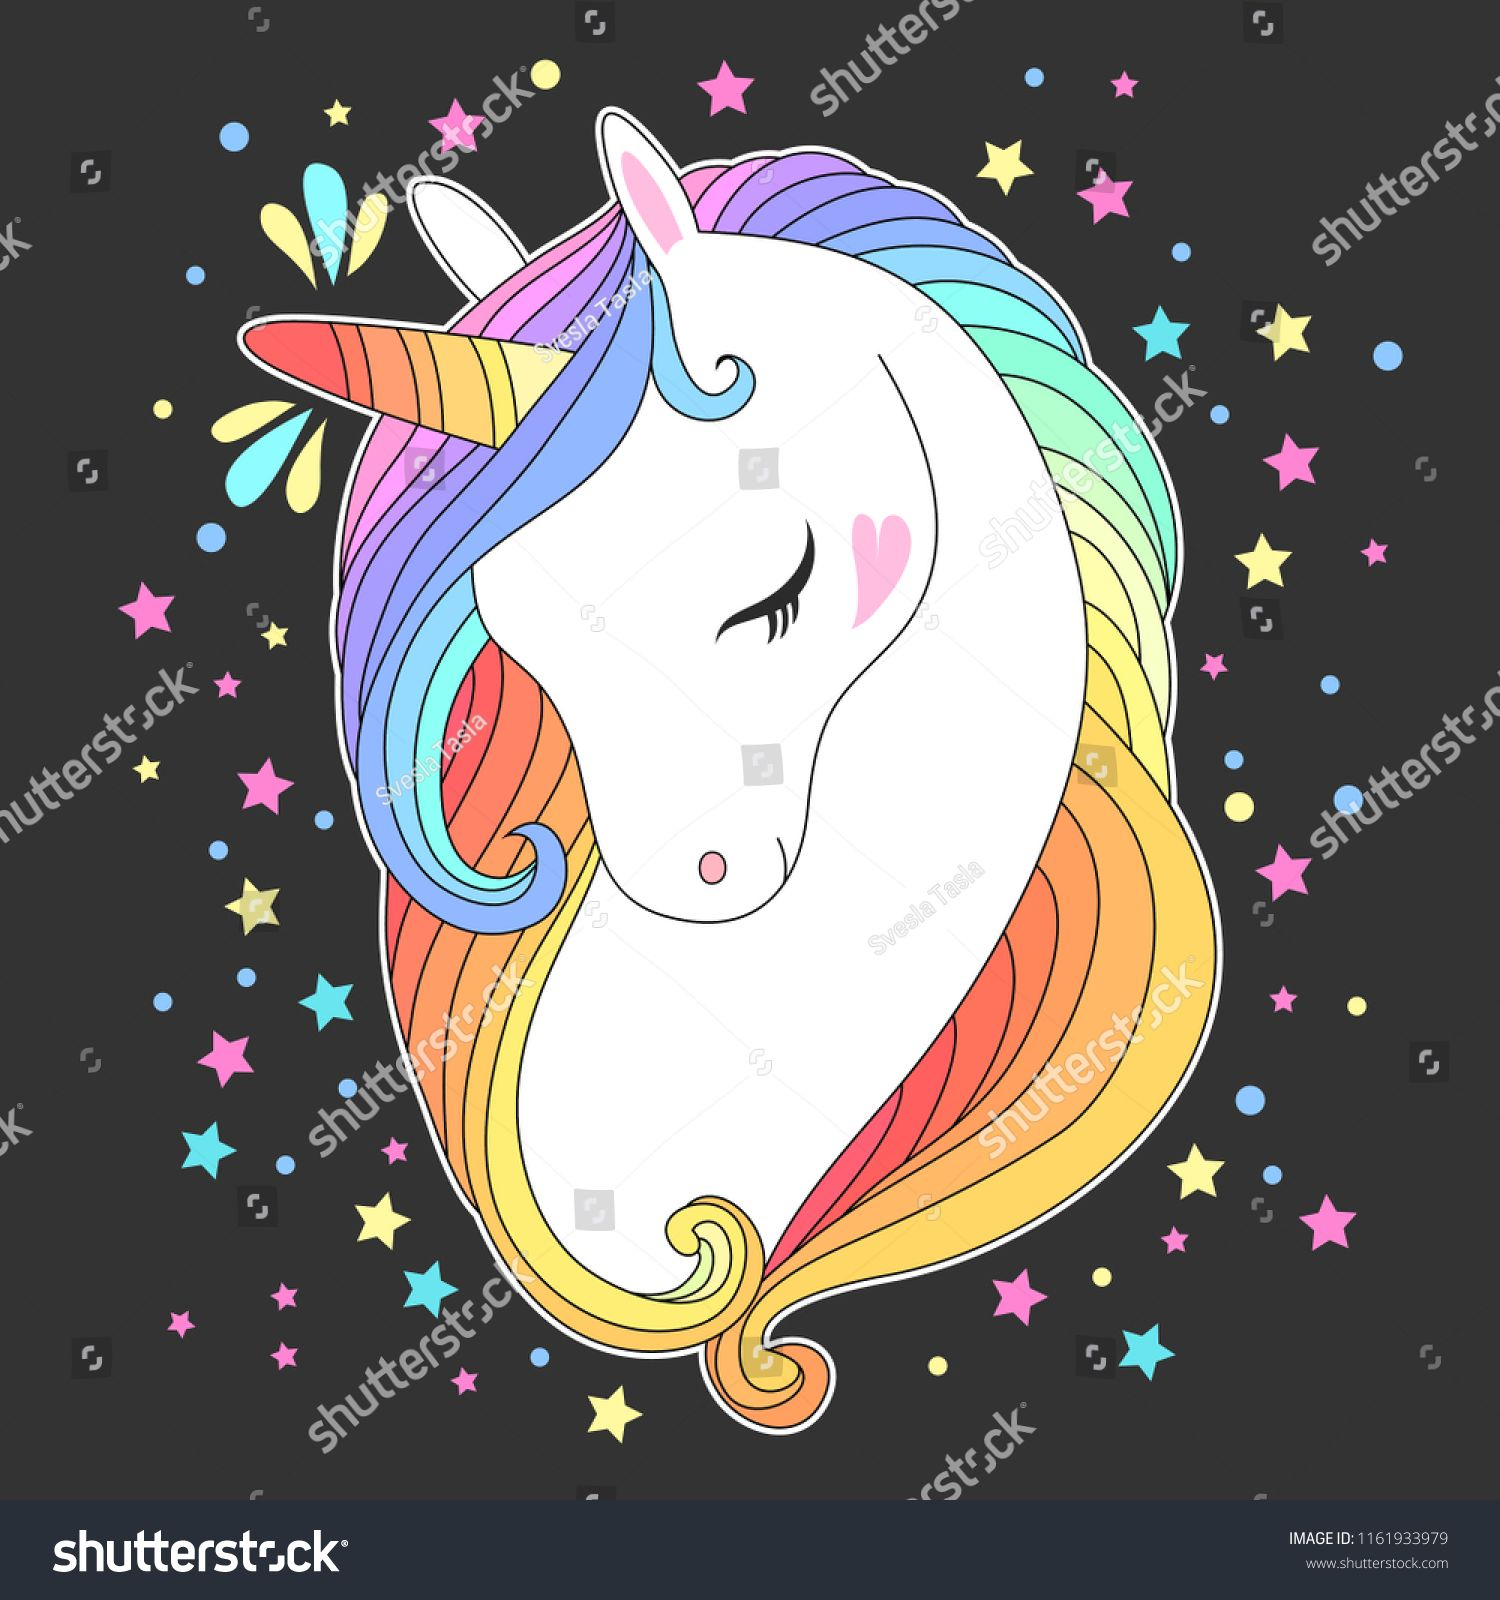 Unicorn Head With Rainbow Hair And Stars Cute Fashion Kids Print